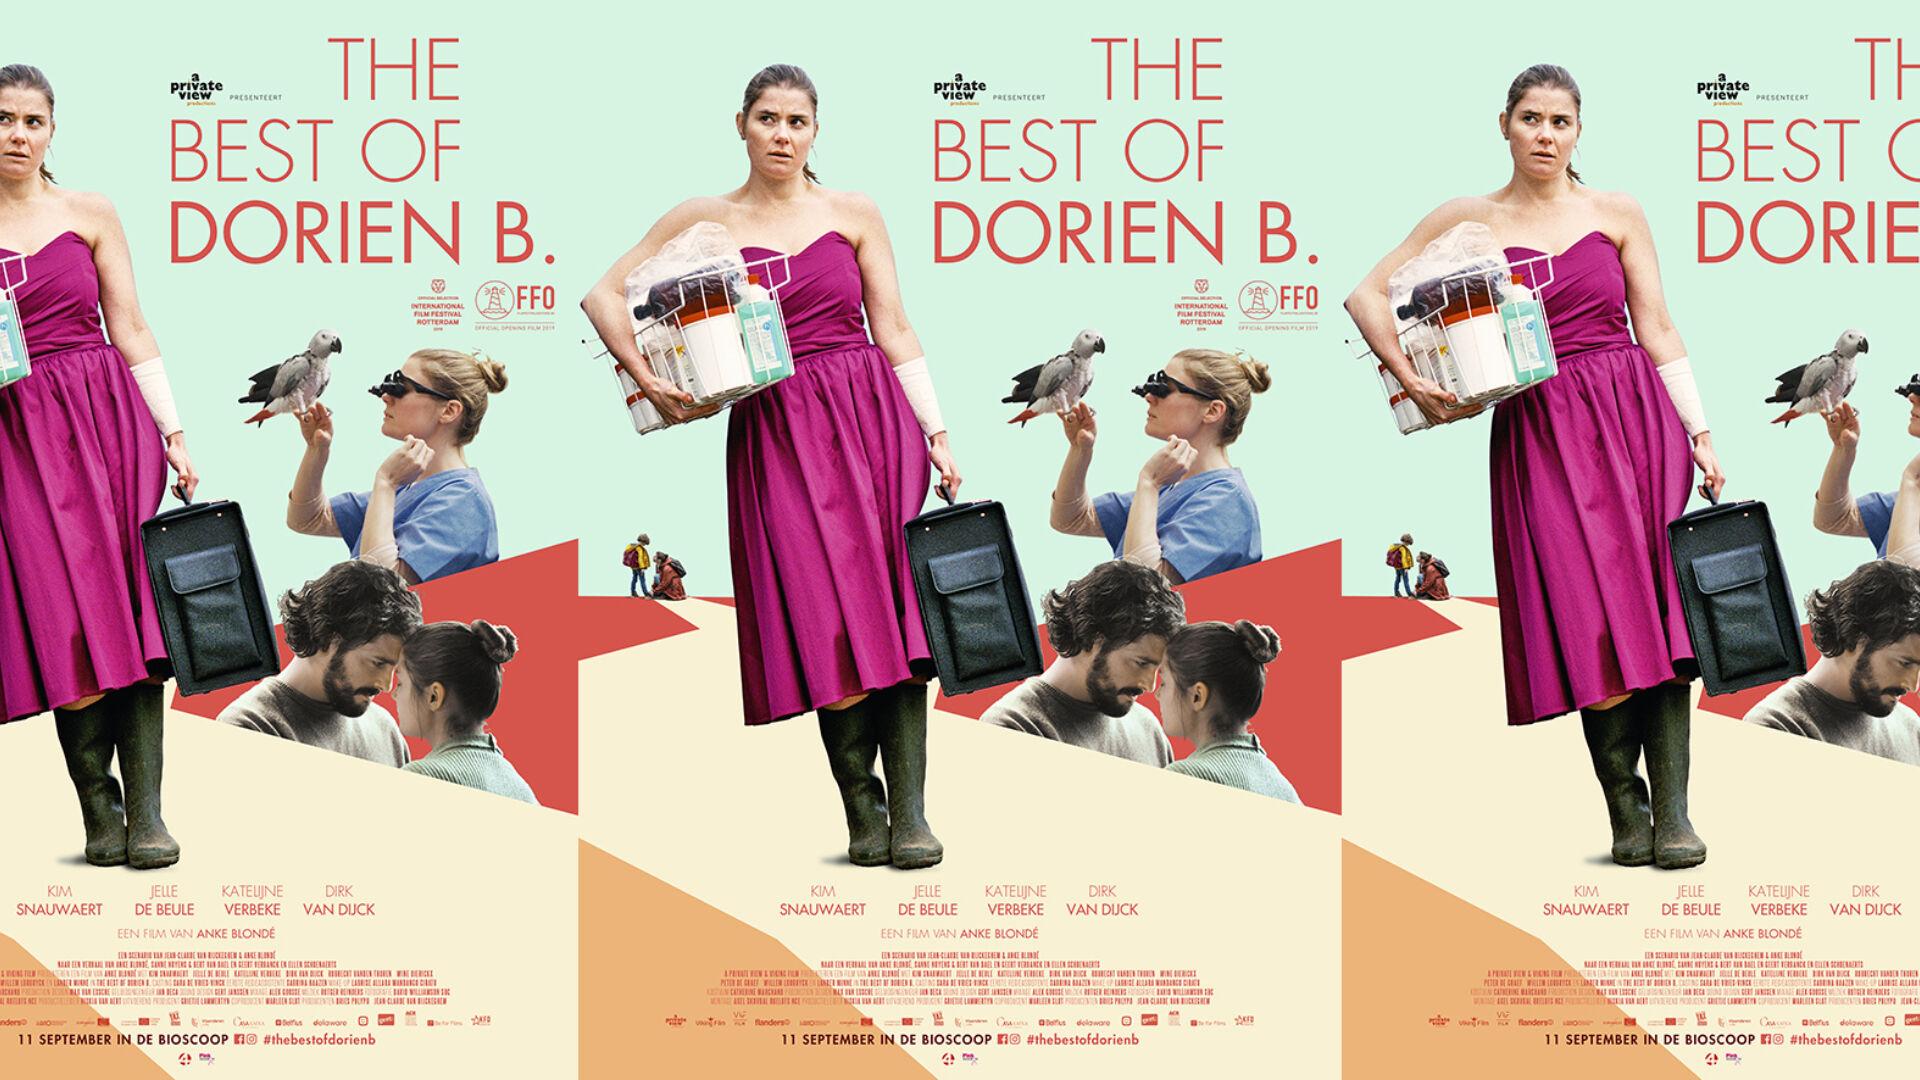 20190425 Pr The Best Of Dorien B Header Pb